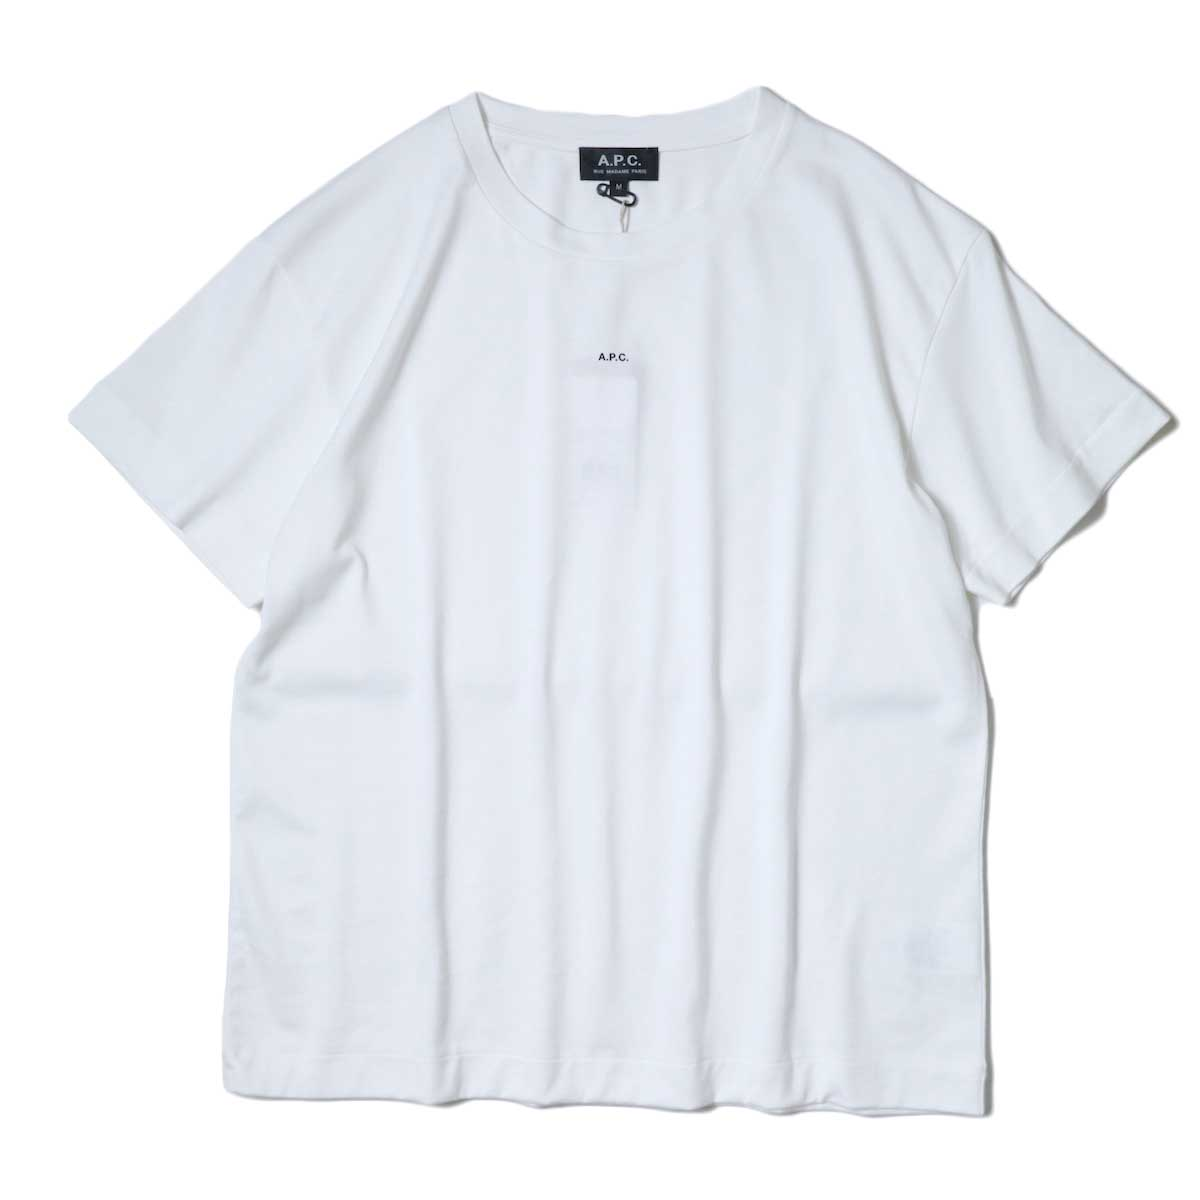 A.P.C. / Jade Tシャツ (White)